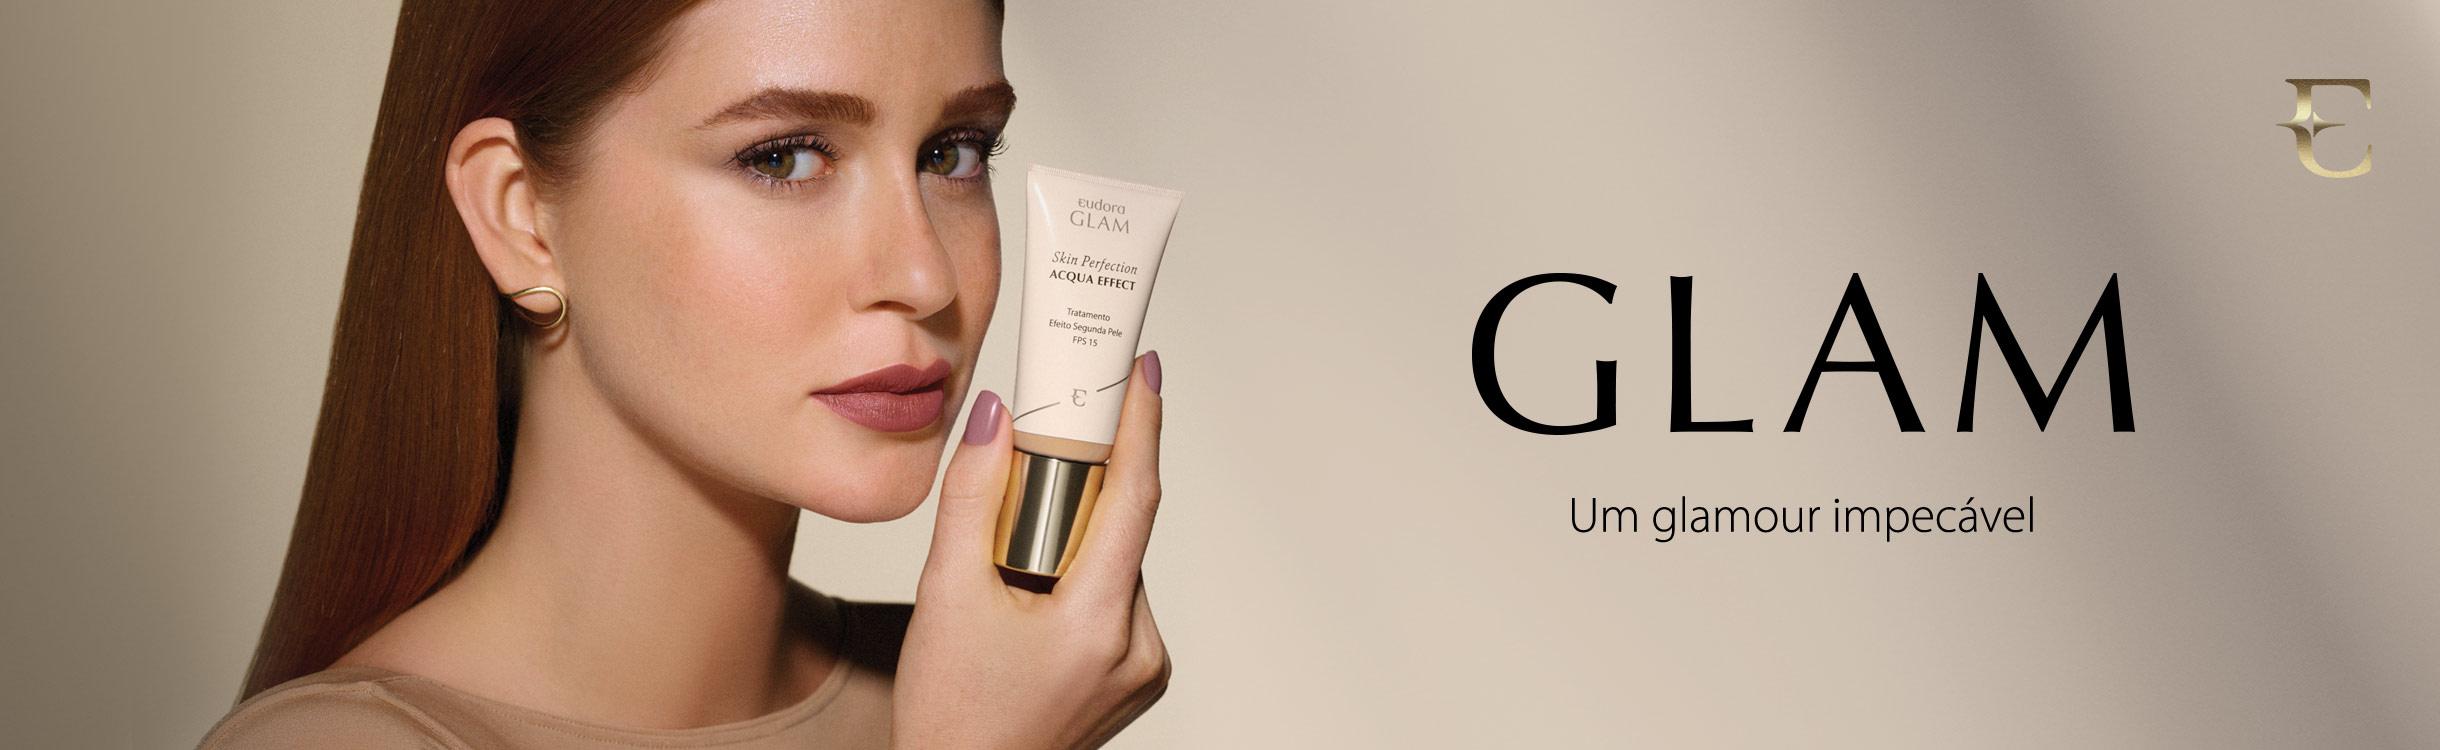 Glam: Kits de Maquiagem